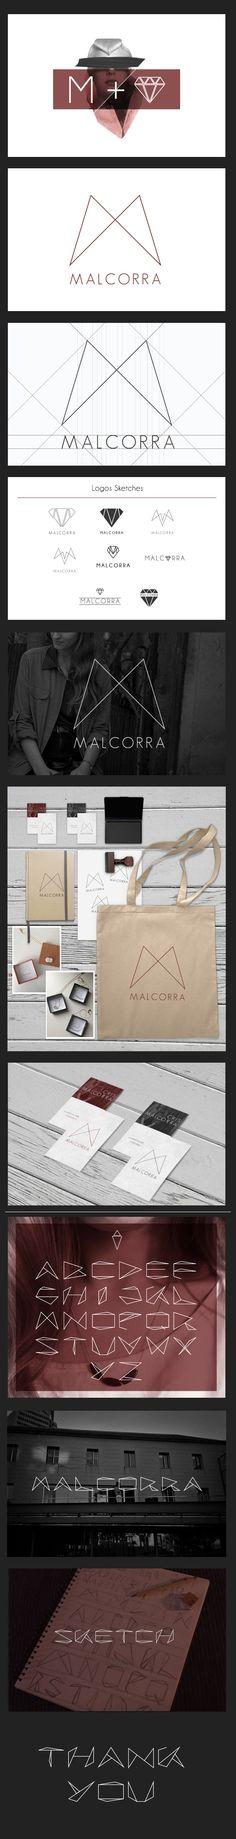 MALCORRA (Branding) by Yonathan Tanu, via Behance